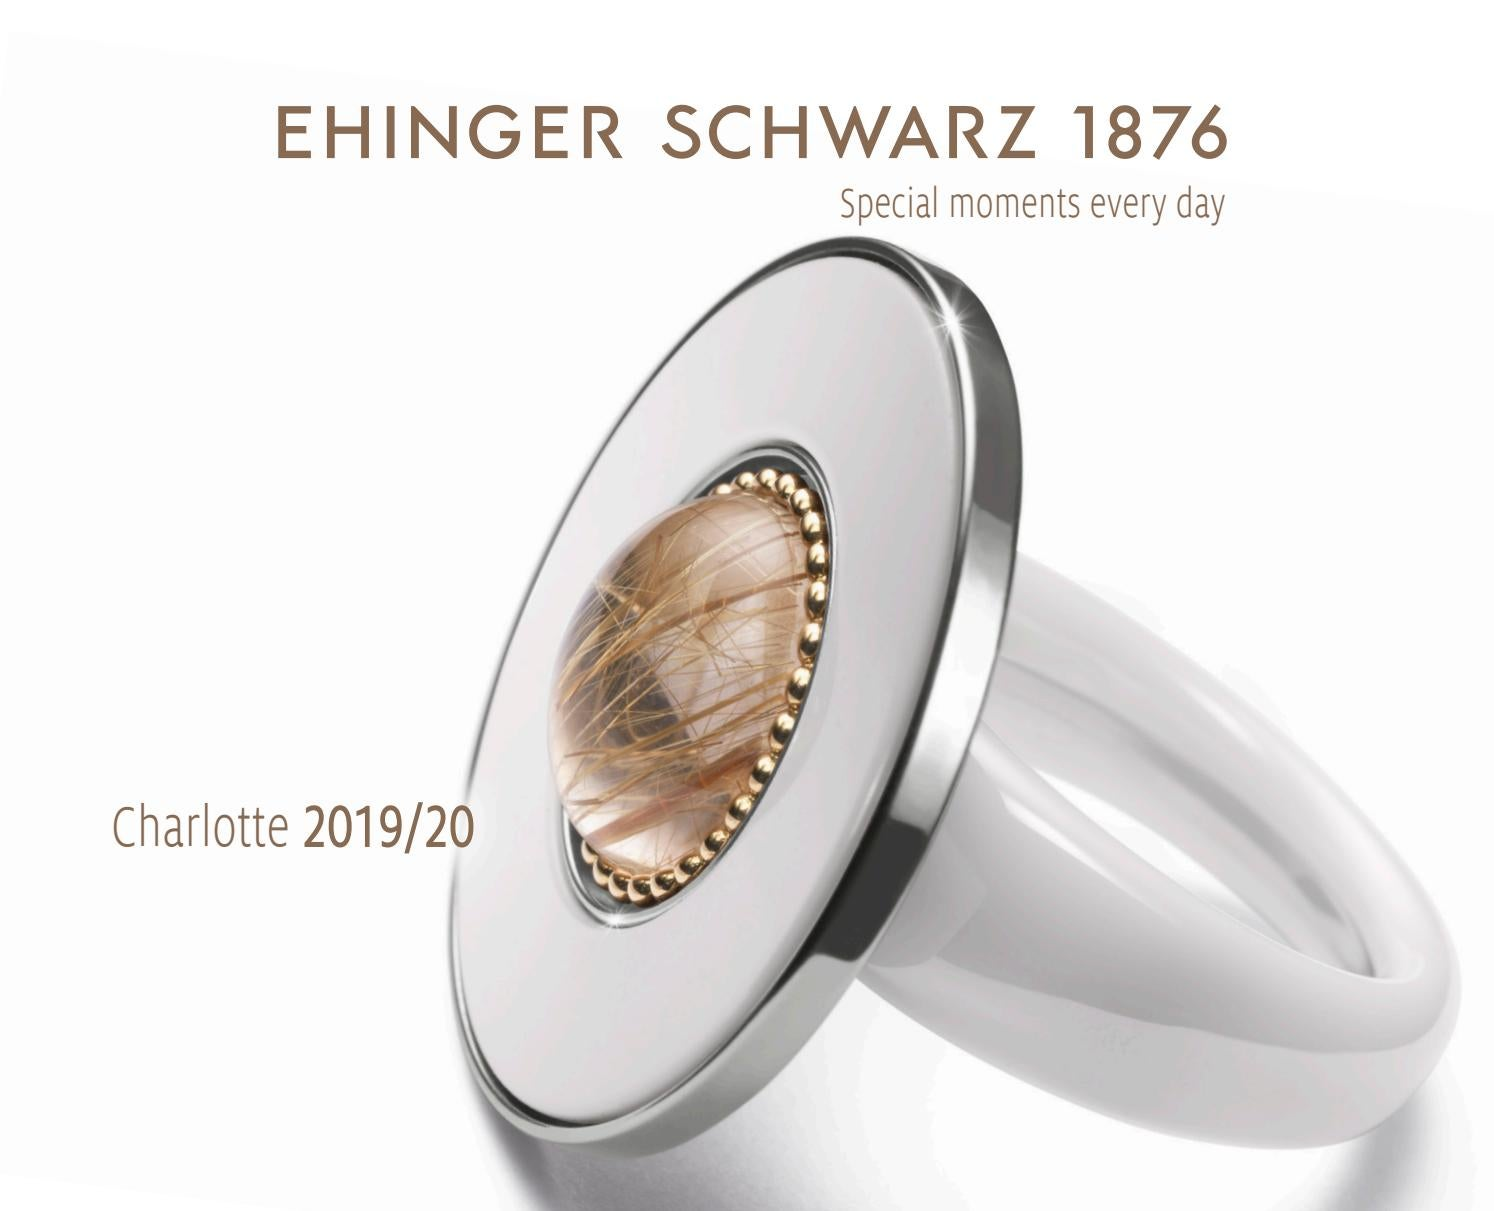 Schmuck-Schmidt-Ohrstecker Black Saphir-Herz Silber-Rhodiniert 0,70 Karat